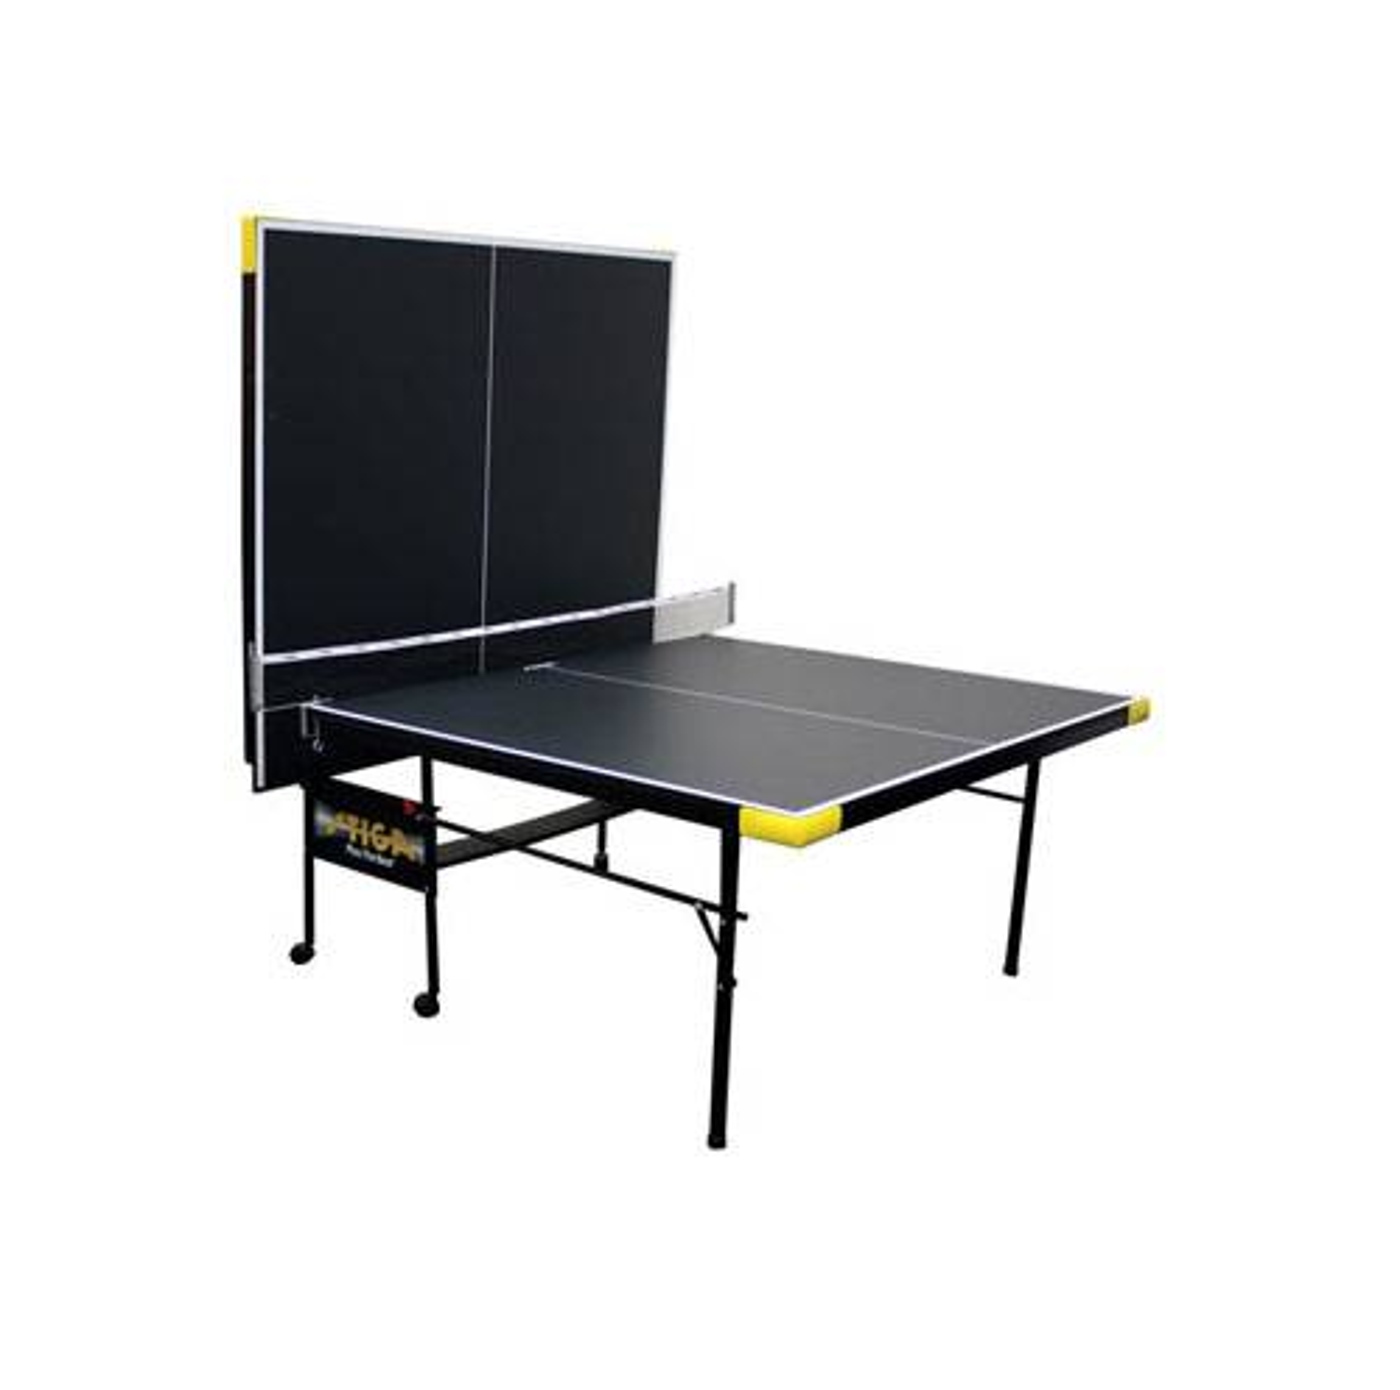 Stiga legacy ping pong table - Prix table ping pong ...